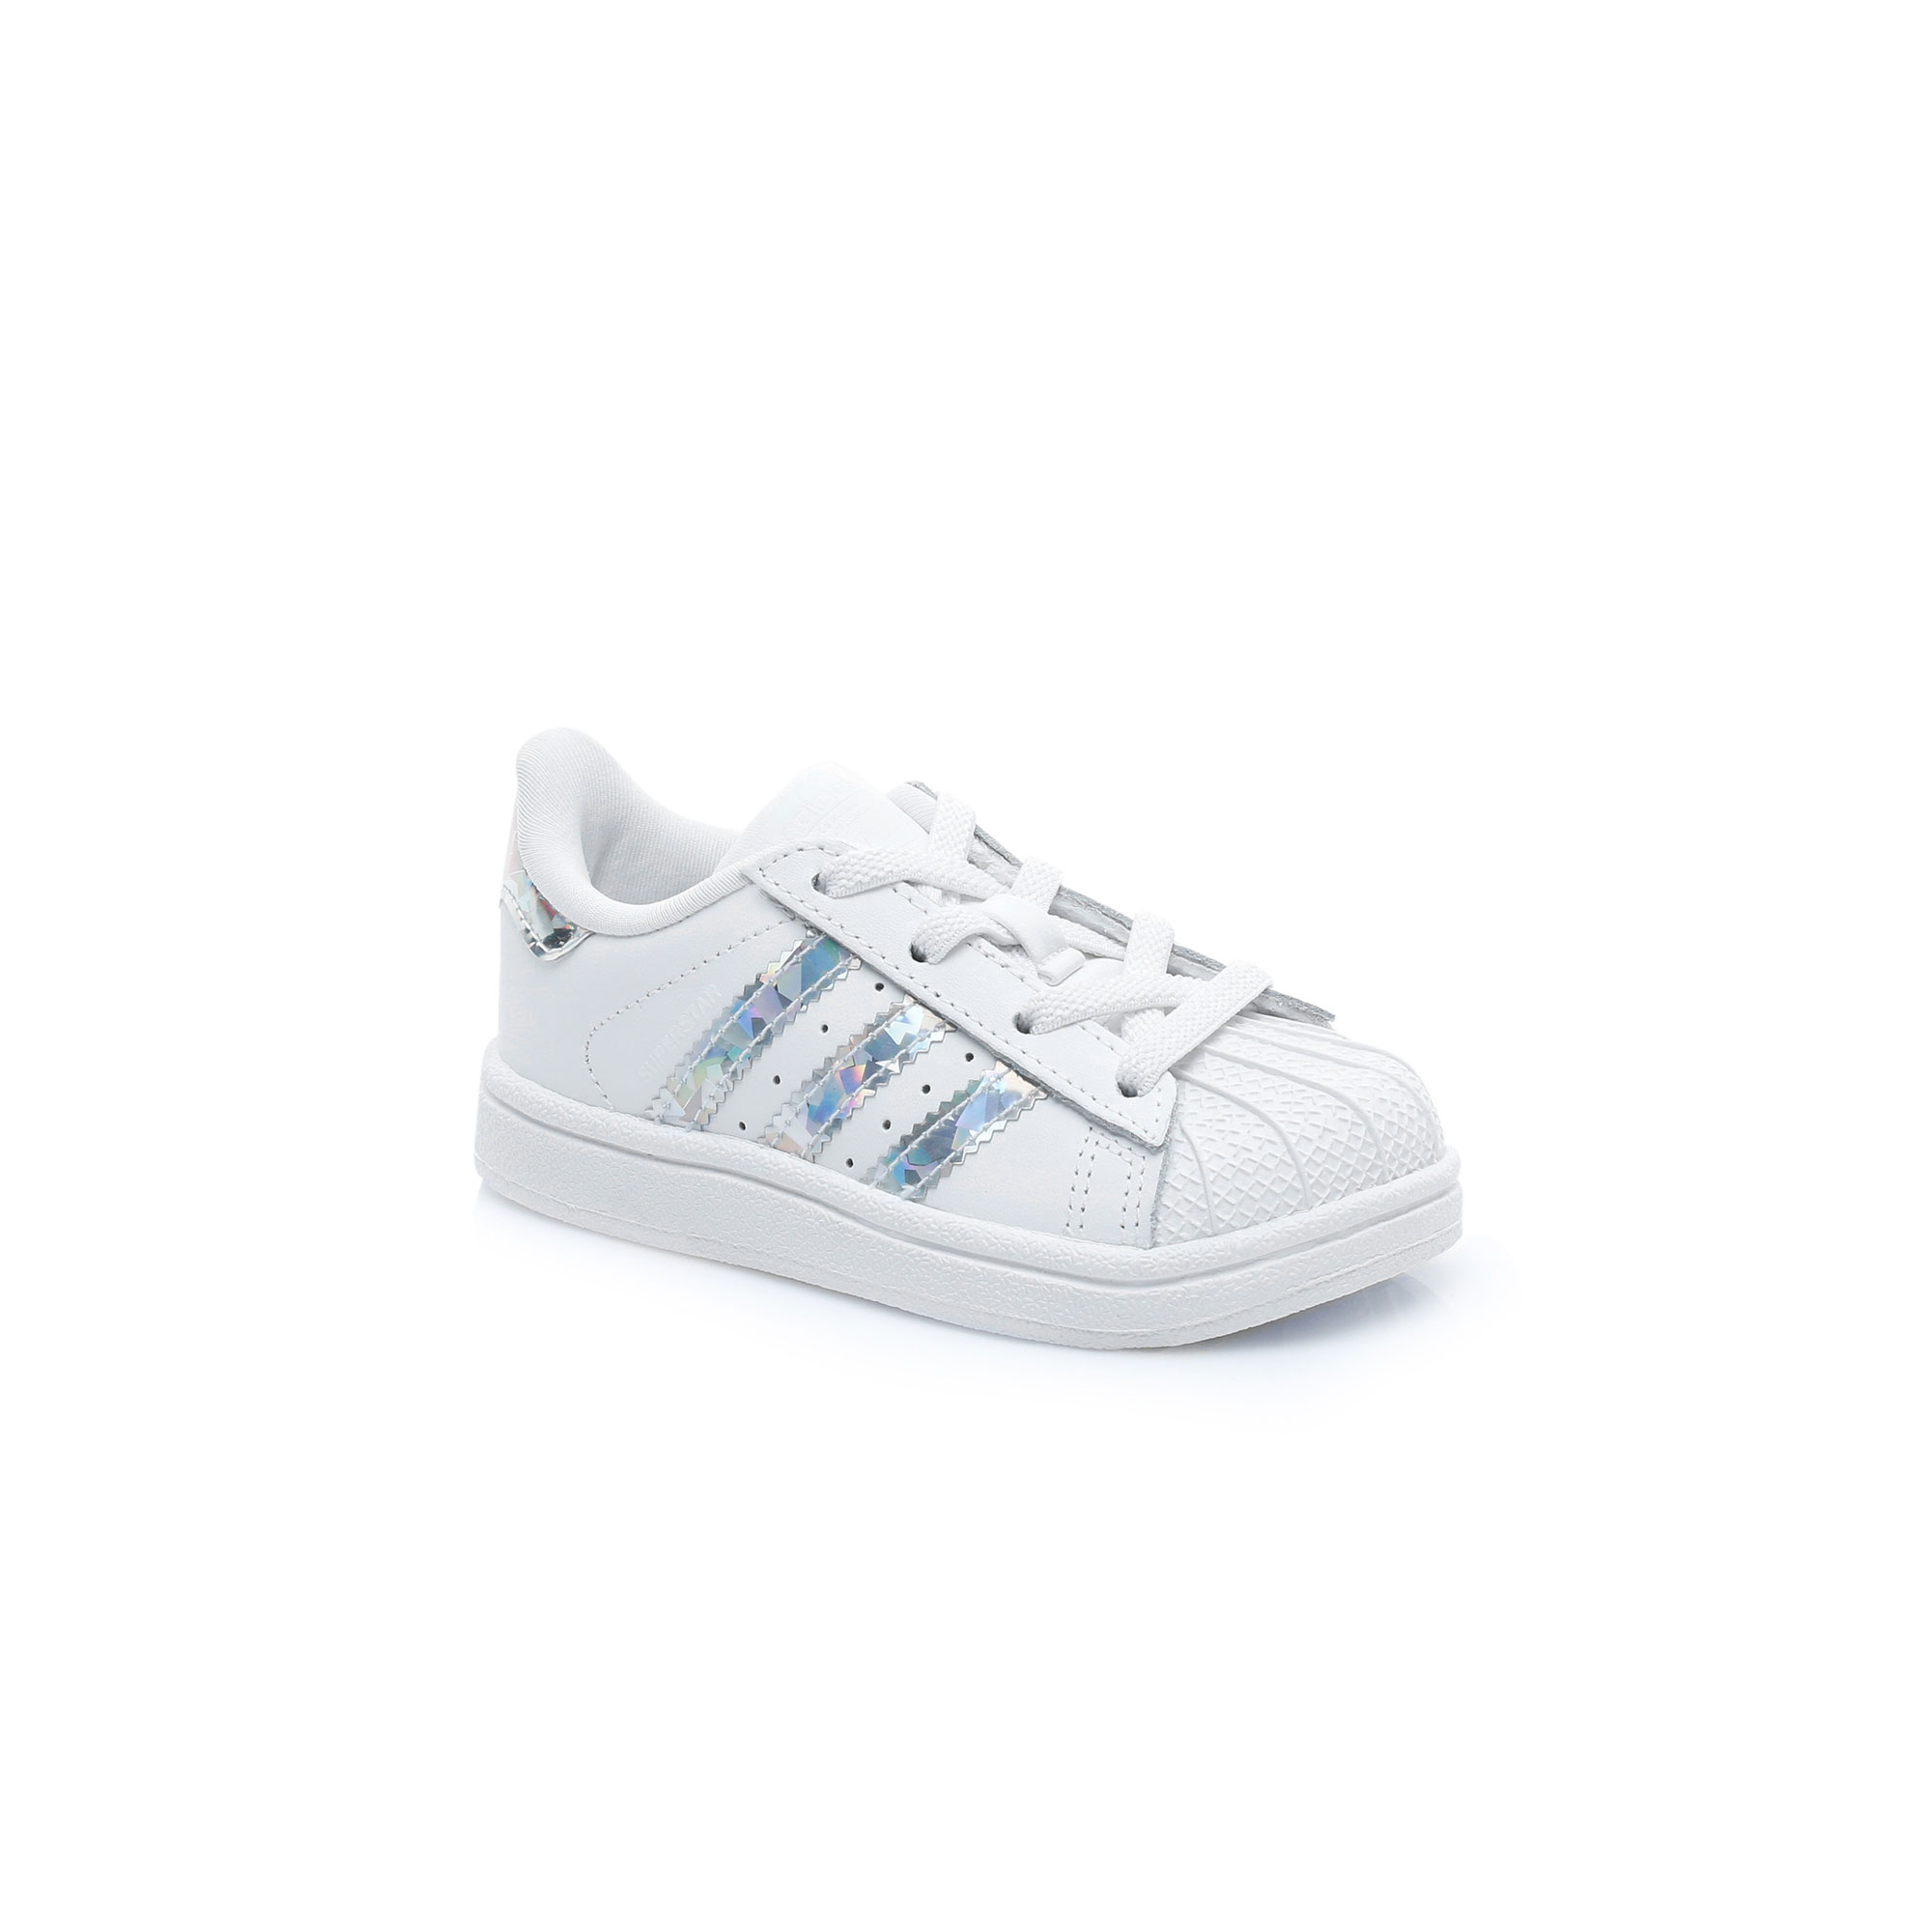 adidas Originals Superstar El Çocuk Beyaz Spor Ayakkabı